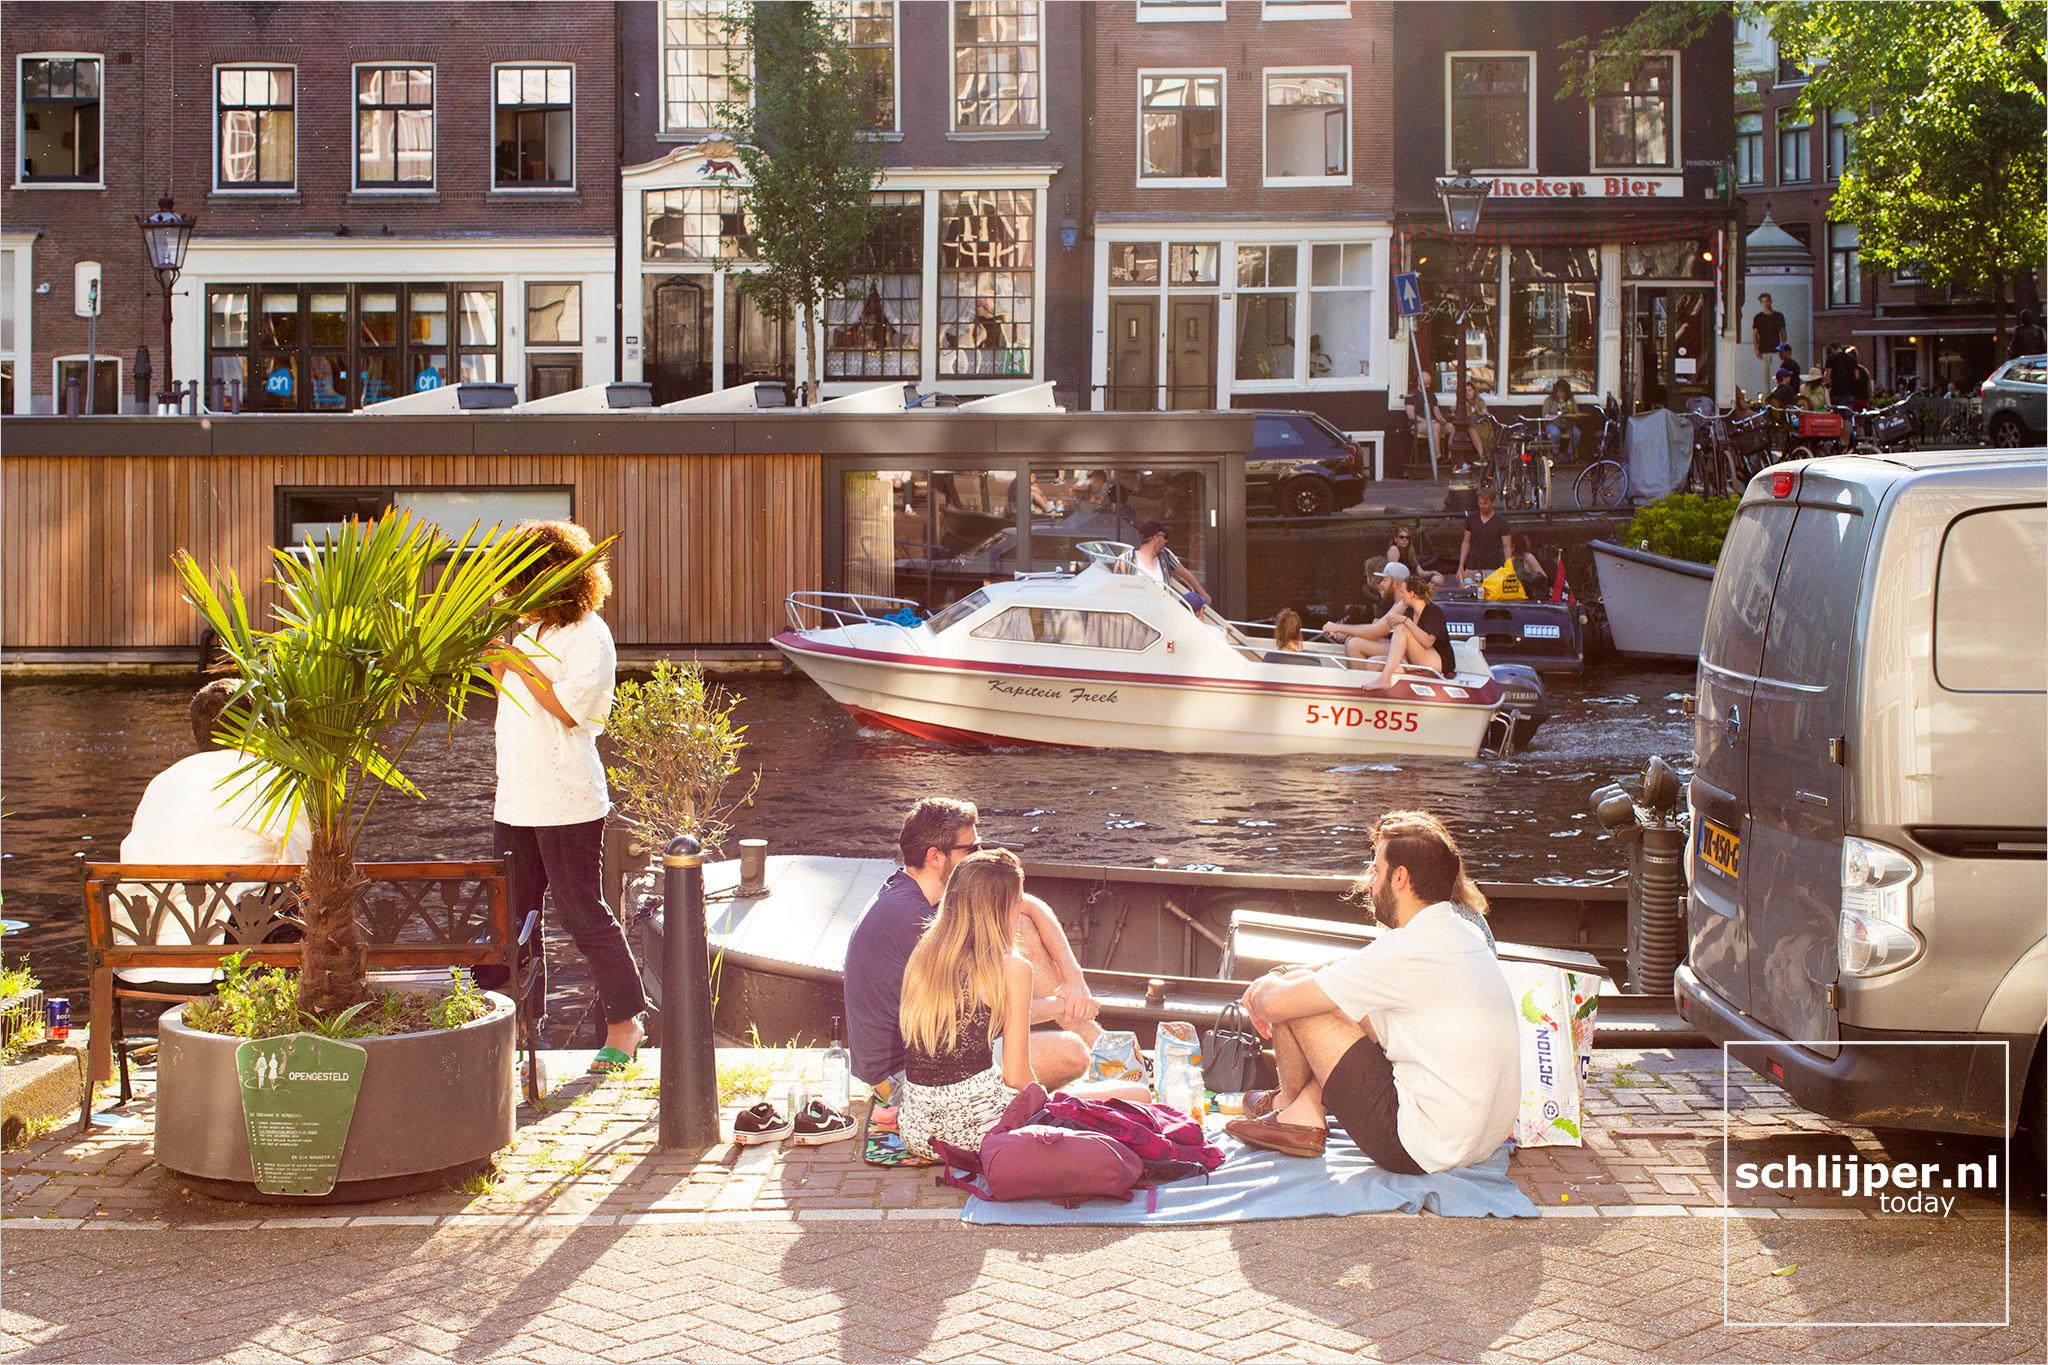 The Netherlands, Amsterdam, 2 juni 2021